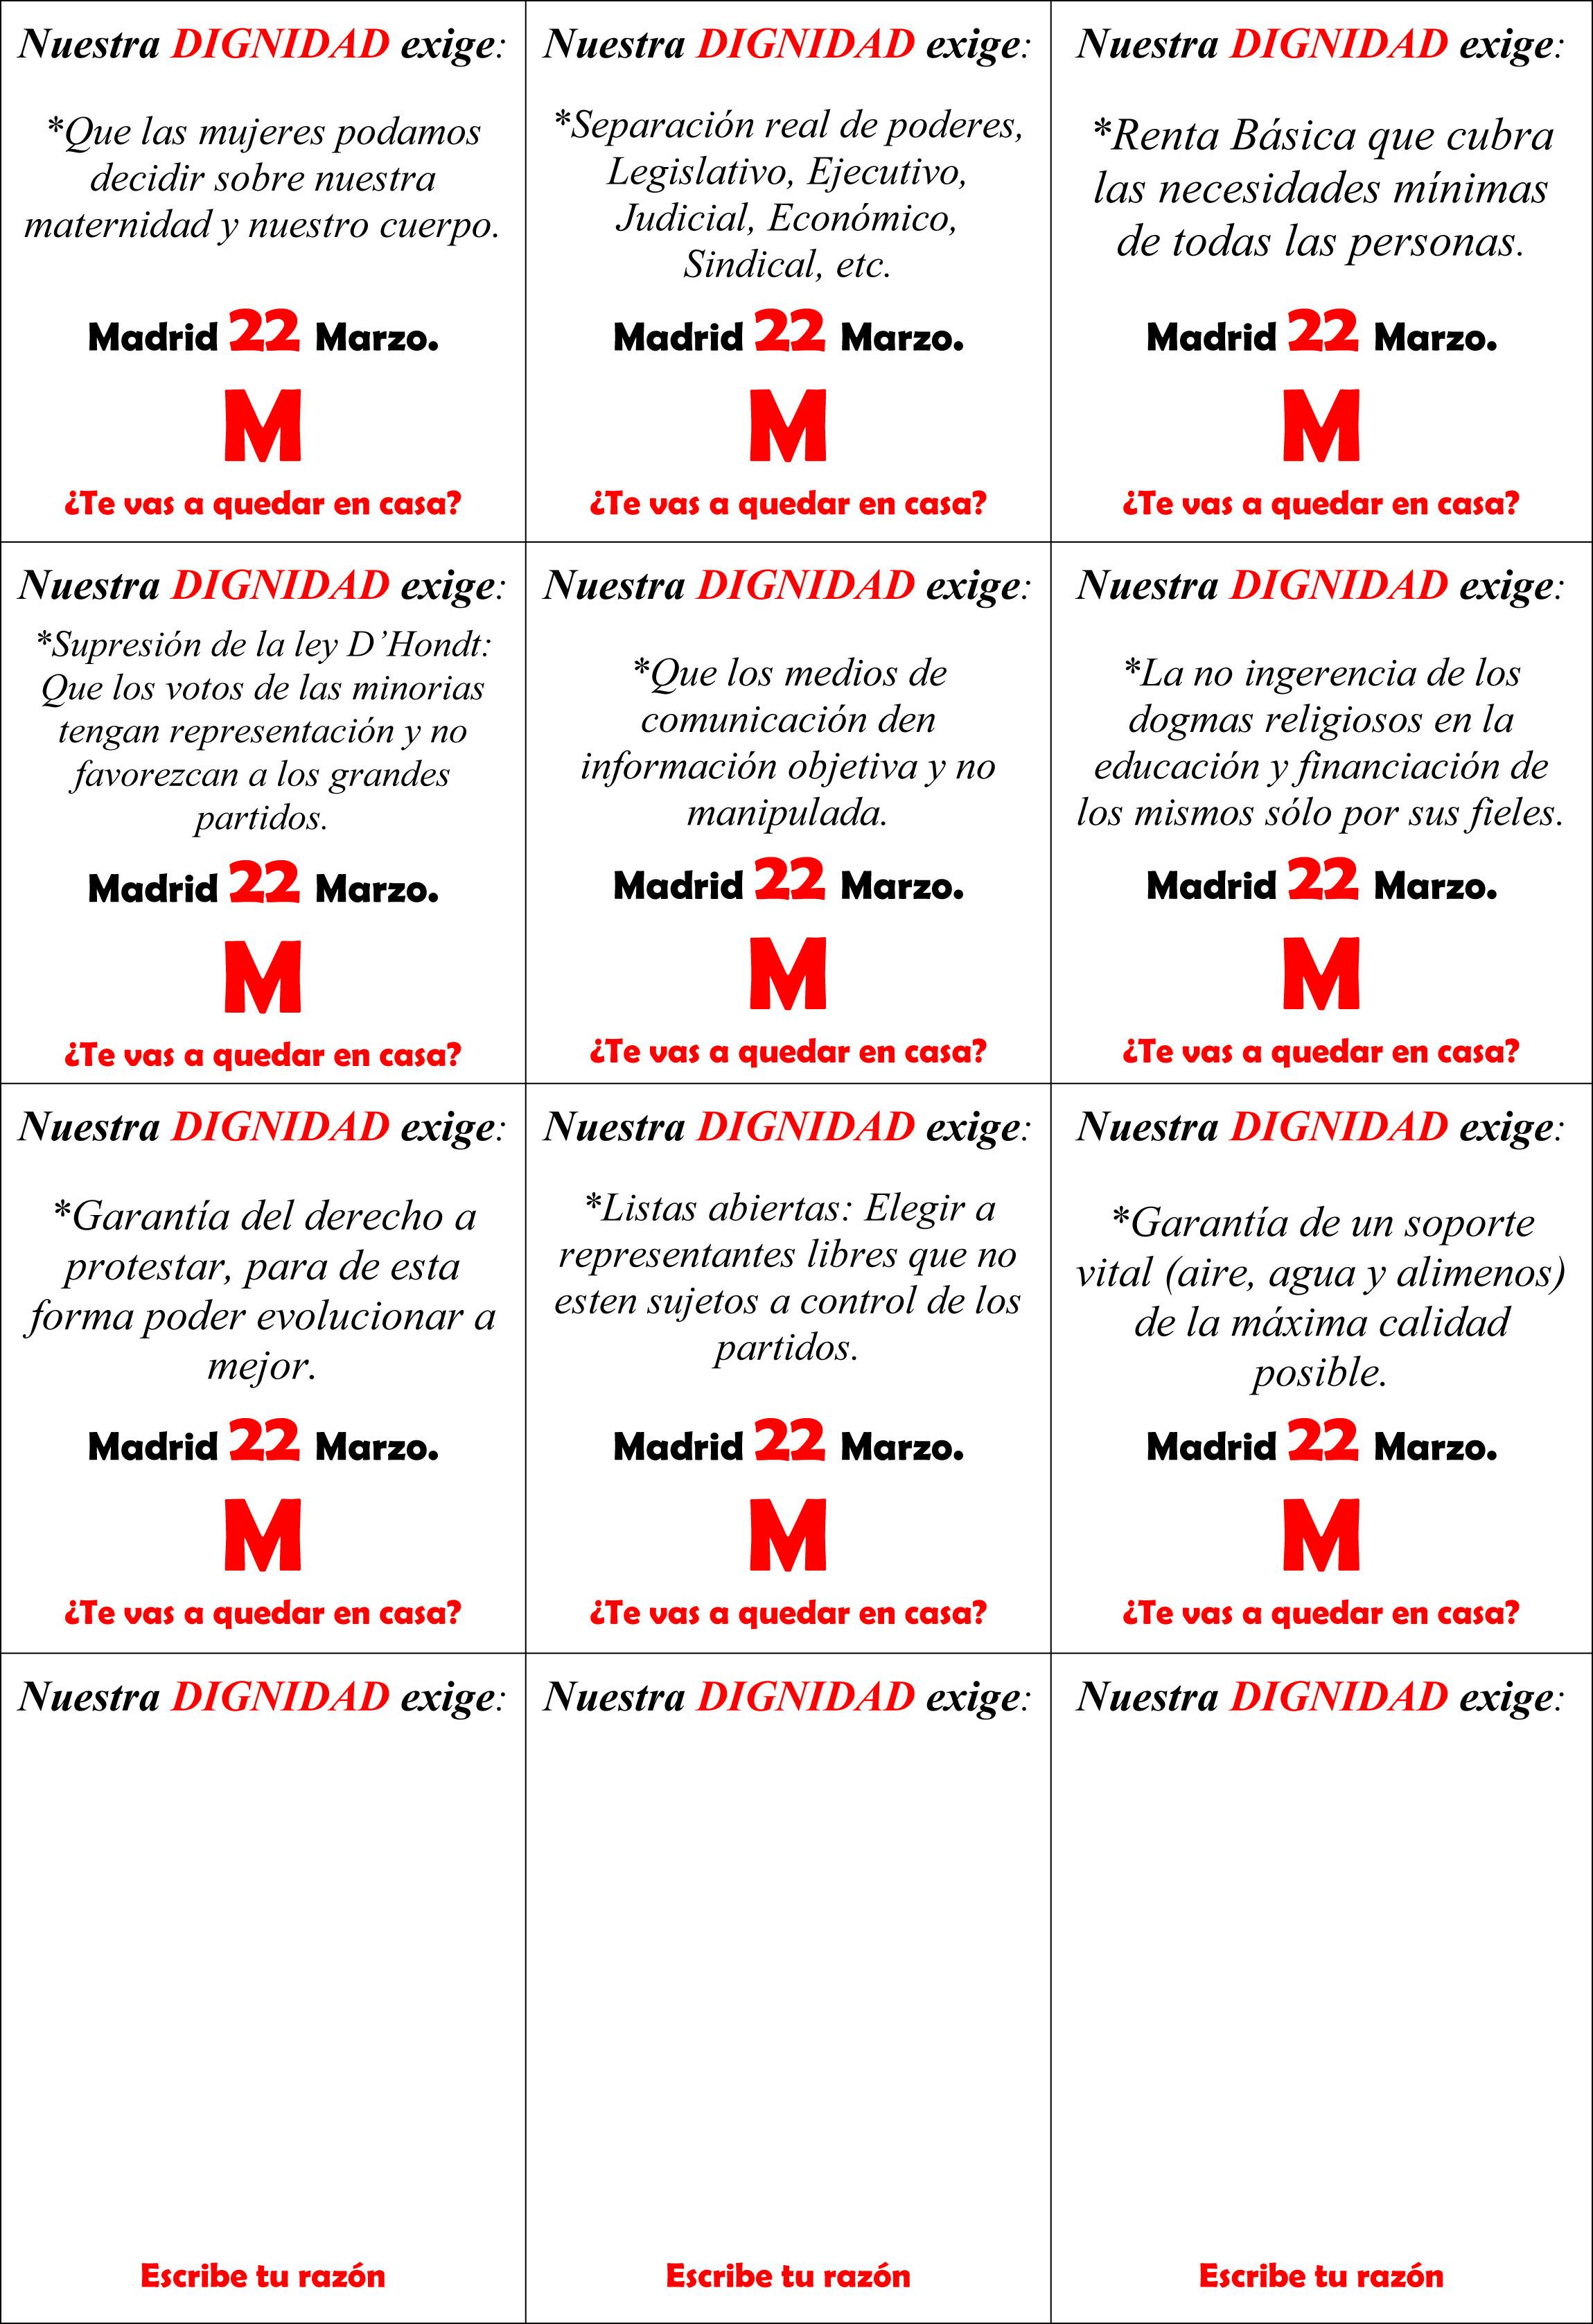 Pildoras y Convocatoria 14M- JPG 2